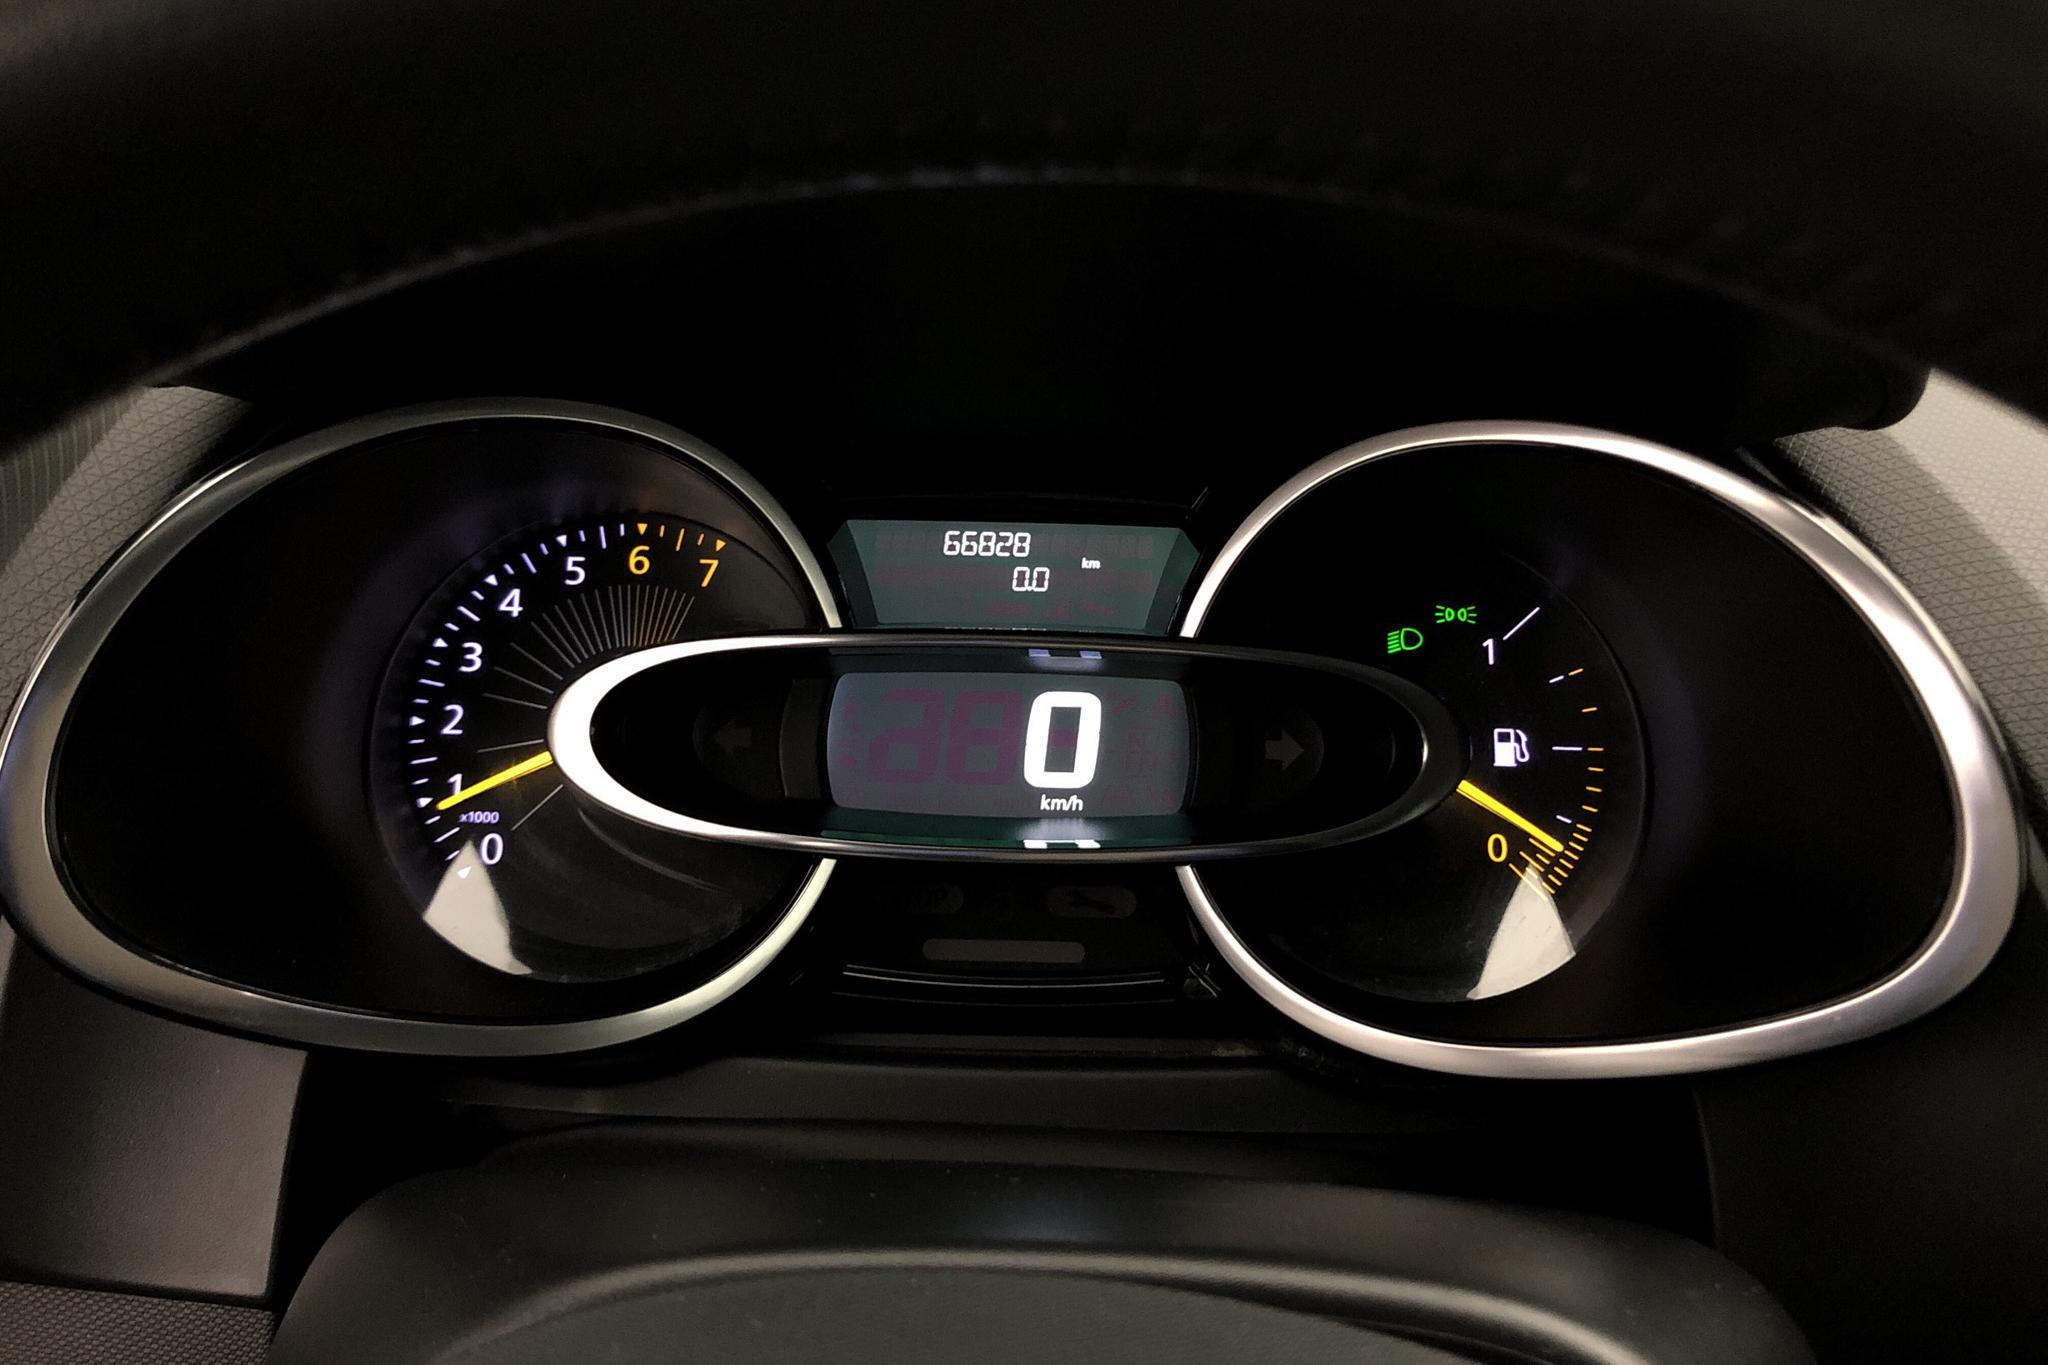 Renault Clio IV 0.9 TCe 90 5dr (90hk) - 6 682 mil - Manuell - svart - 2015